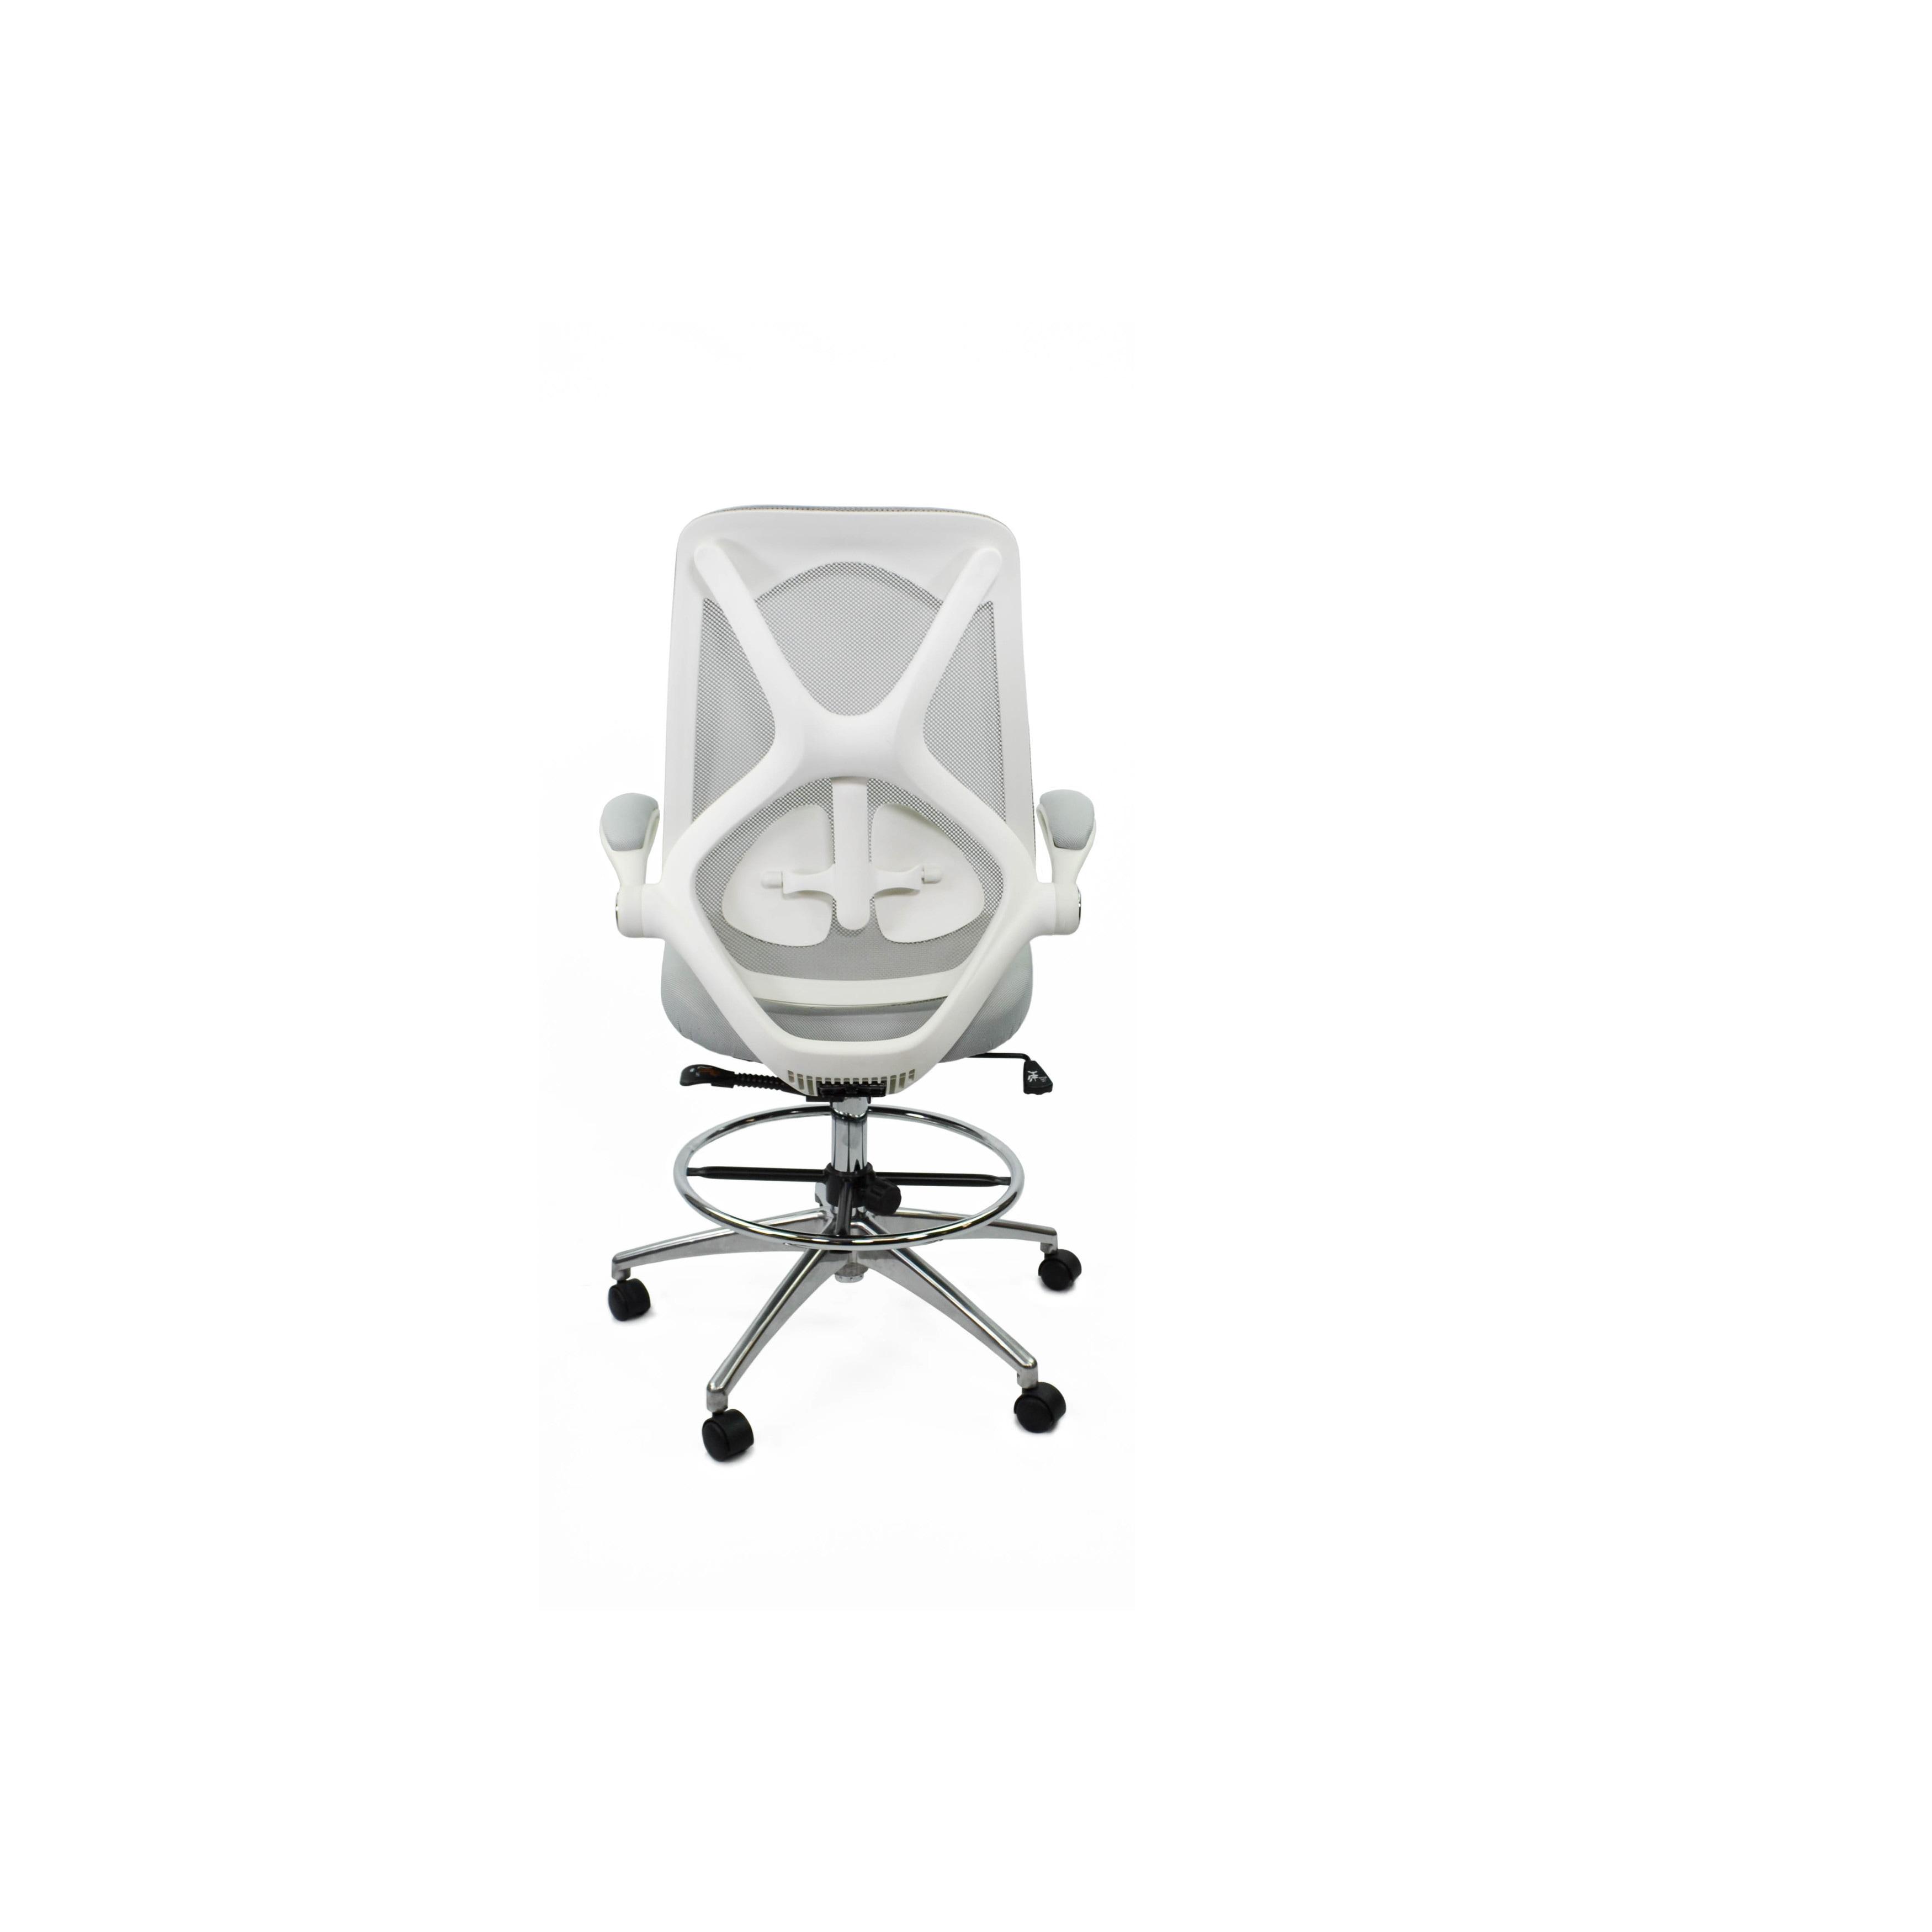 Ergonomic Adjustable Drafting Chair Ergonomic Drafting